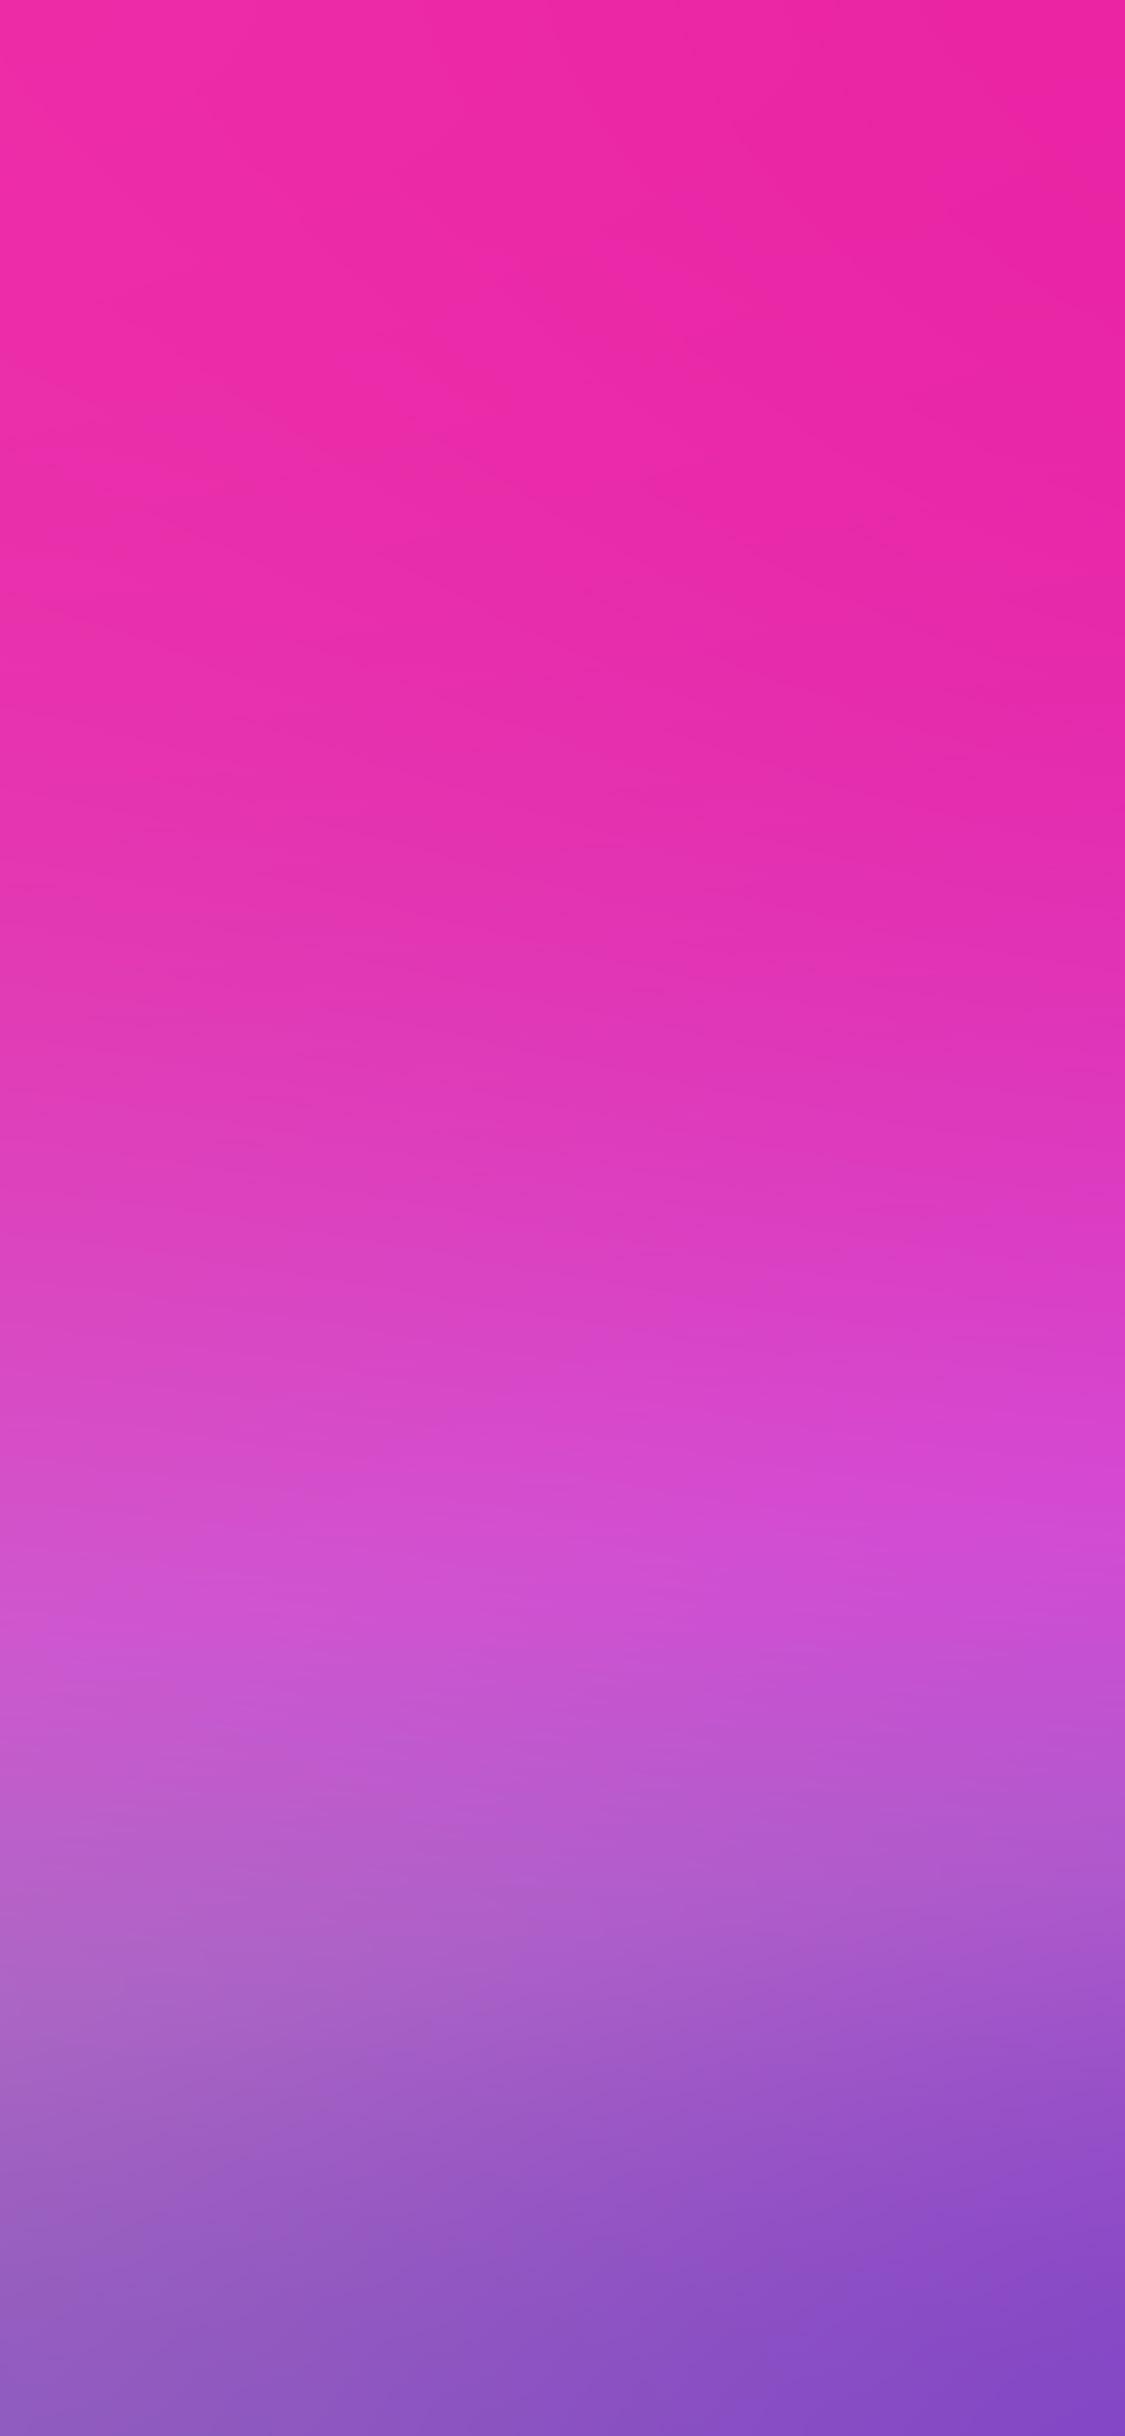 iPhonexpapers.com-Apple-iPhone-wallpaper-so09-pink-neon-sexy-blur-gradation